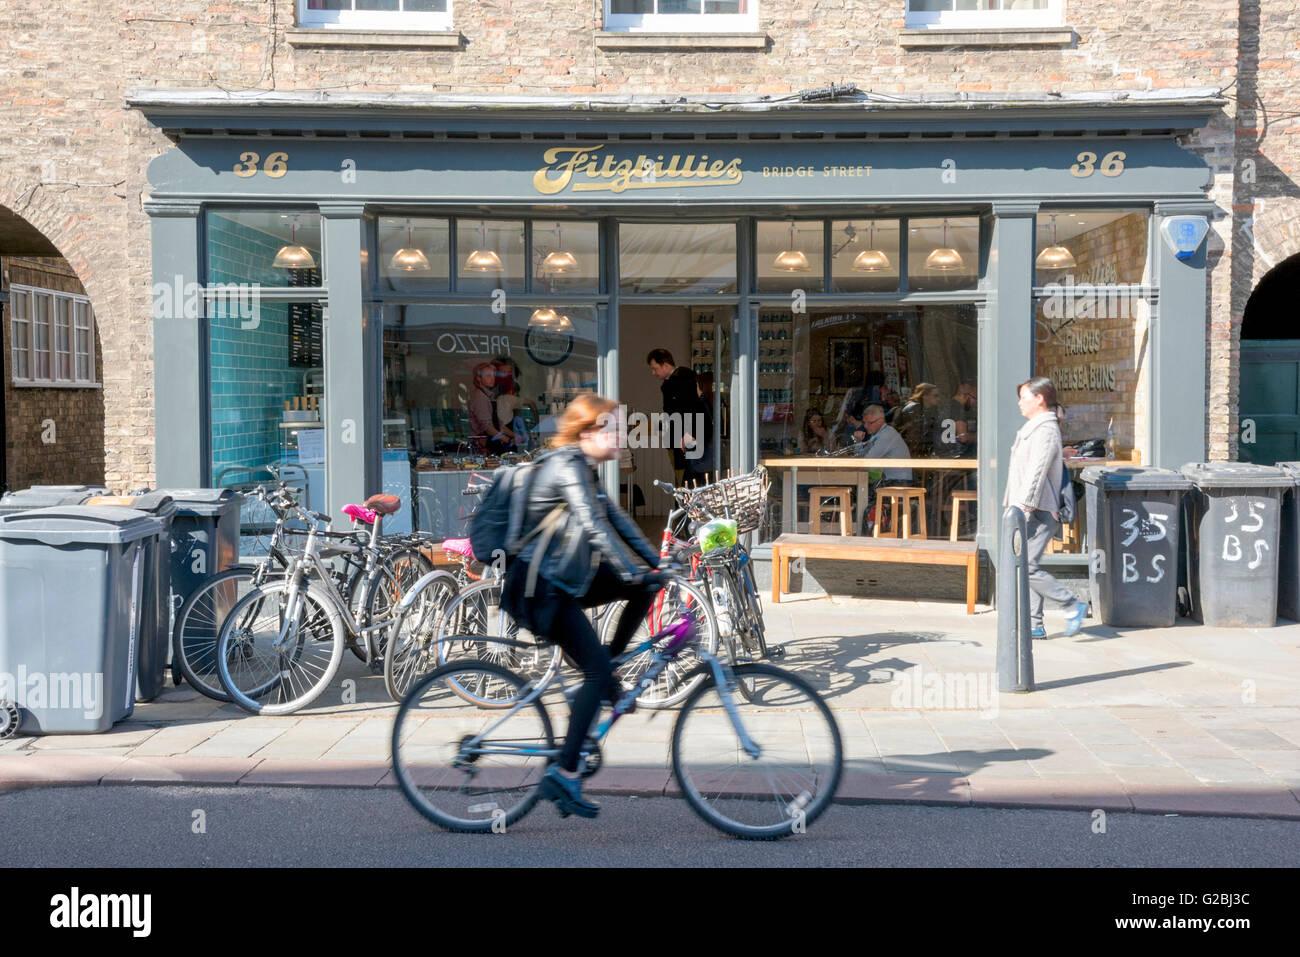 The new Fitzbillies cafe and restaurant in Bridge Street Cambridge UK Stock Photo